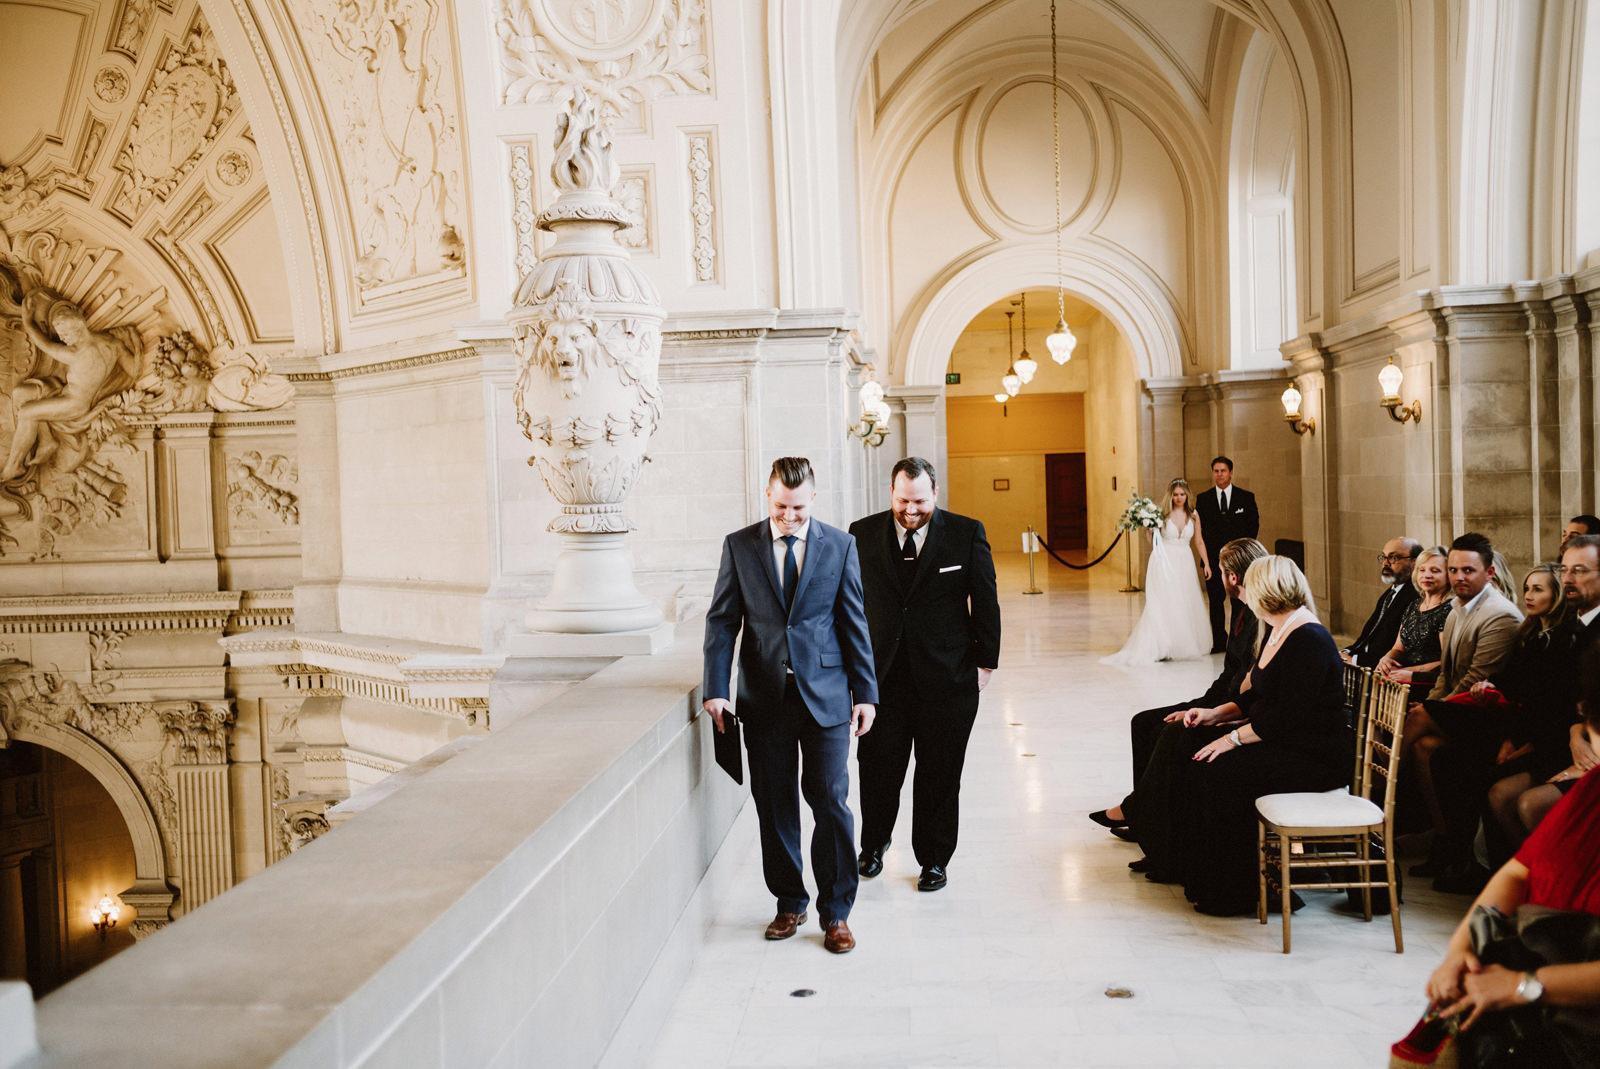 san-francisco-city-hall-elopement-09 SAN FRANCISCO CITY HALL INTIMATE WEDDING